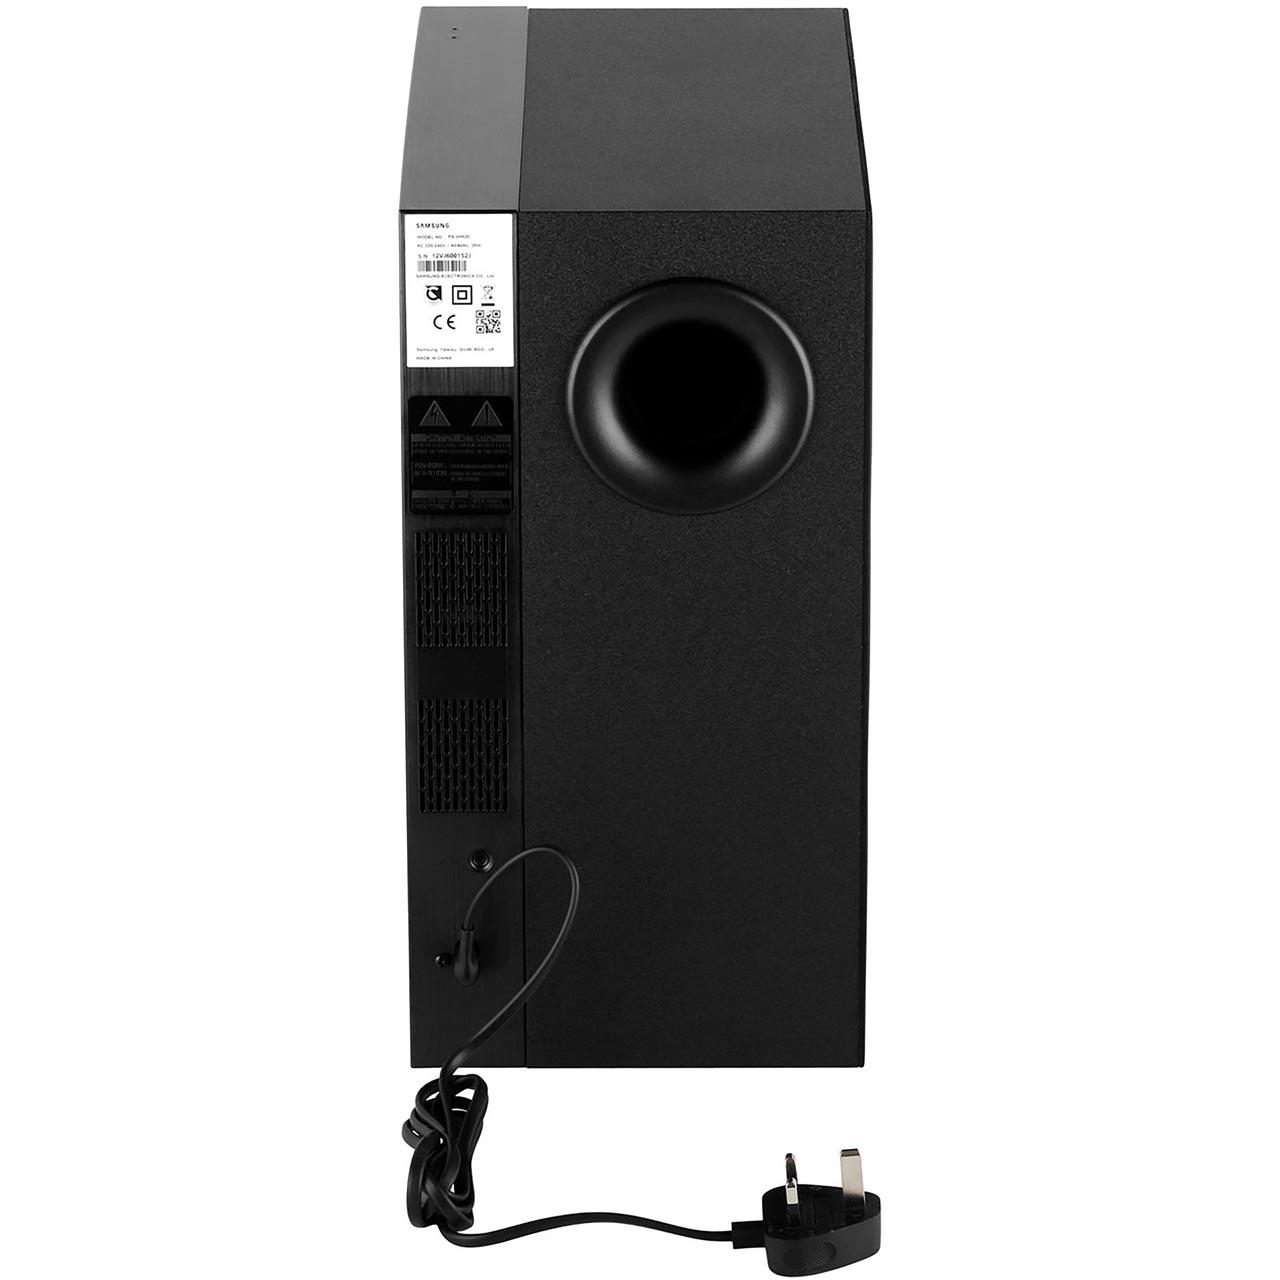 Top Blackweb Bluetooth Soundbar Manual - CBD